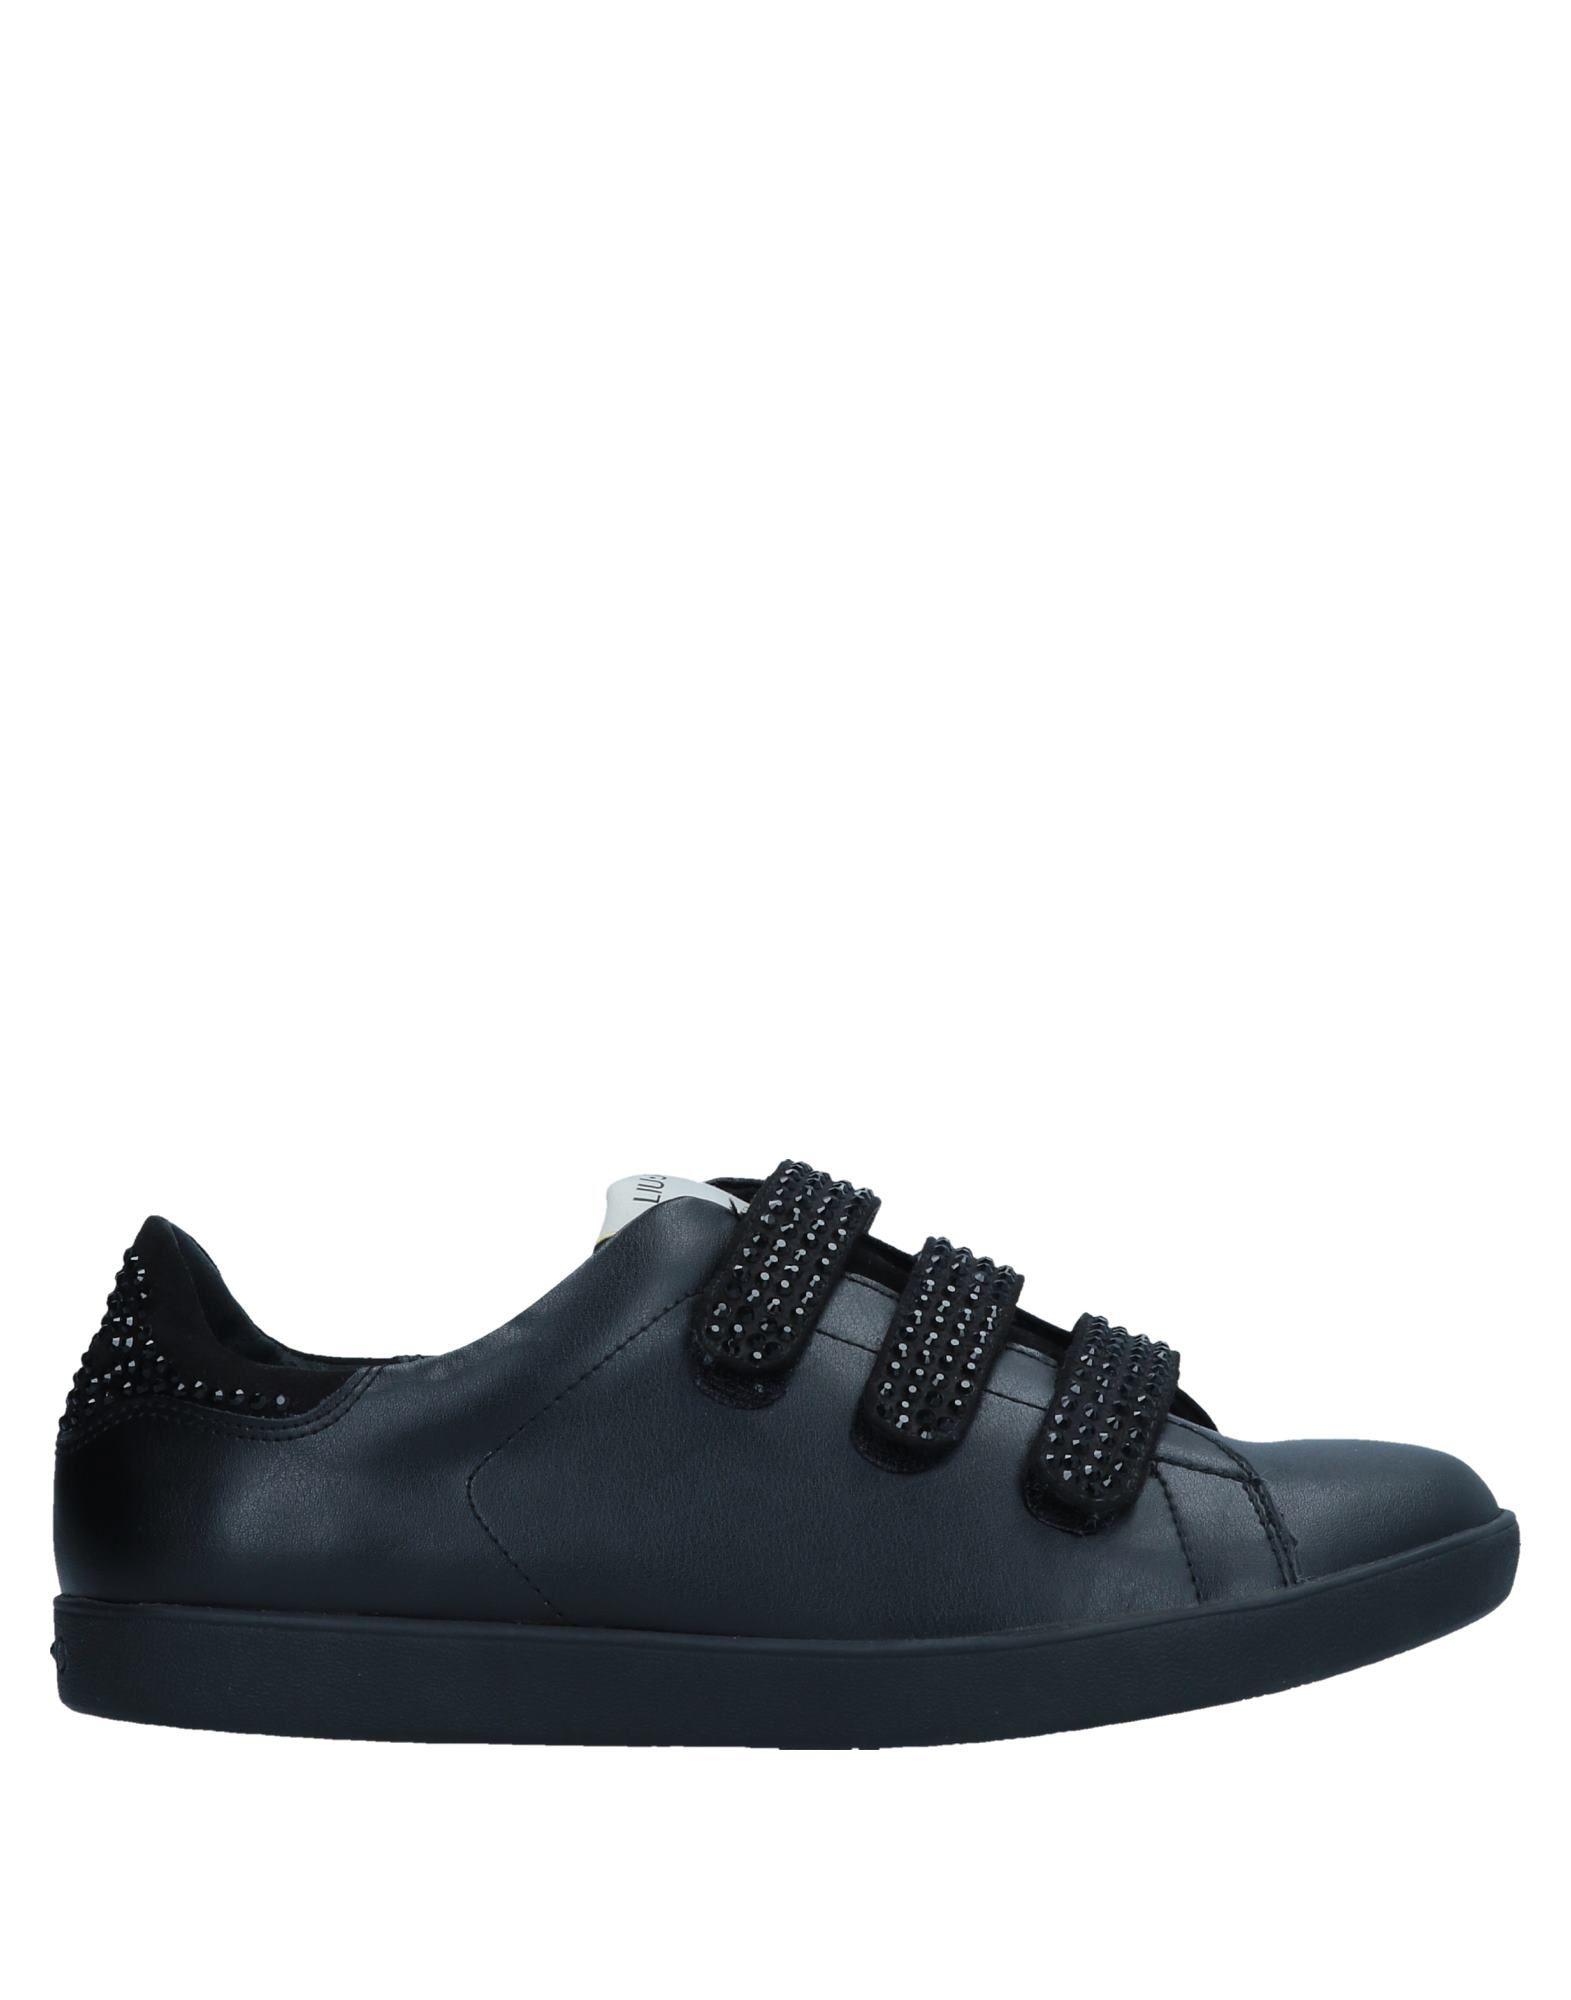 Liu •Jo Shoes Sneakers Qualität Damen  11547416JL Gute Qualität Sneakers beliebte Schuhe 106c5a